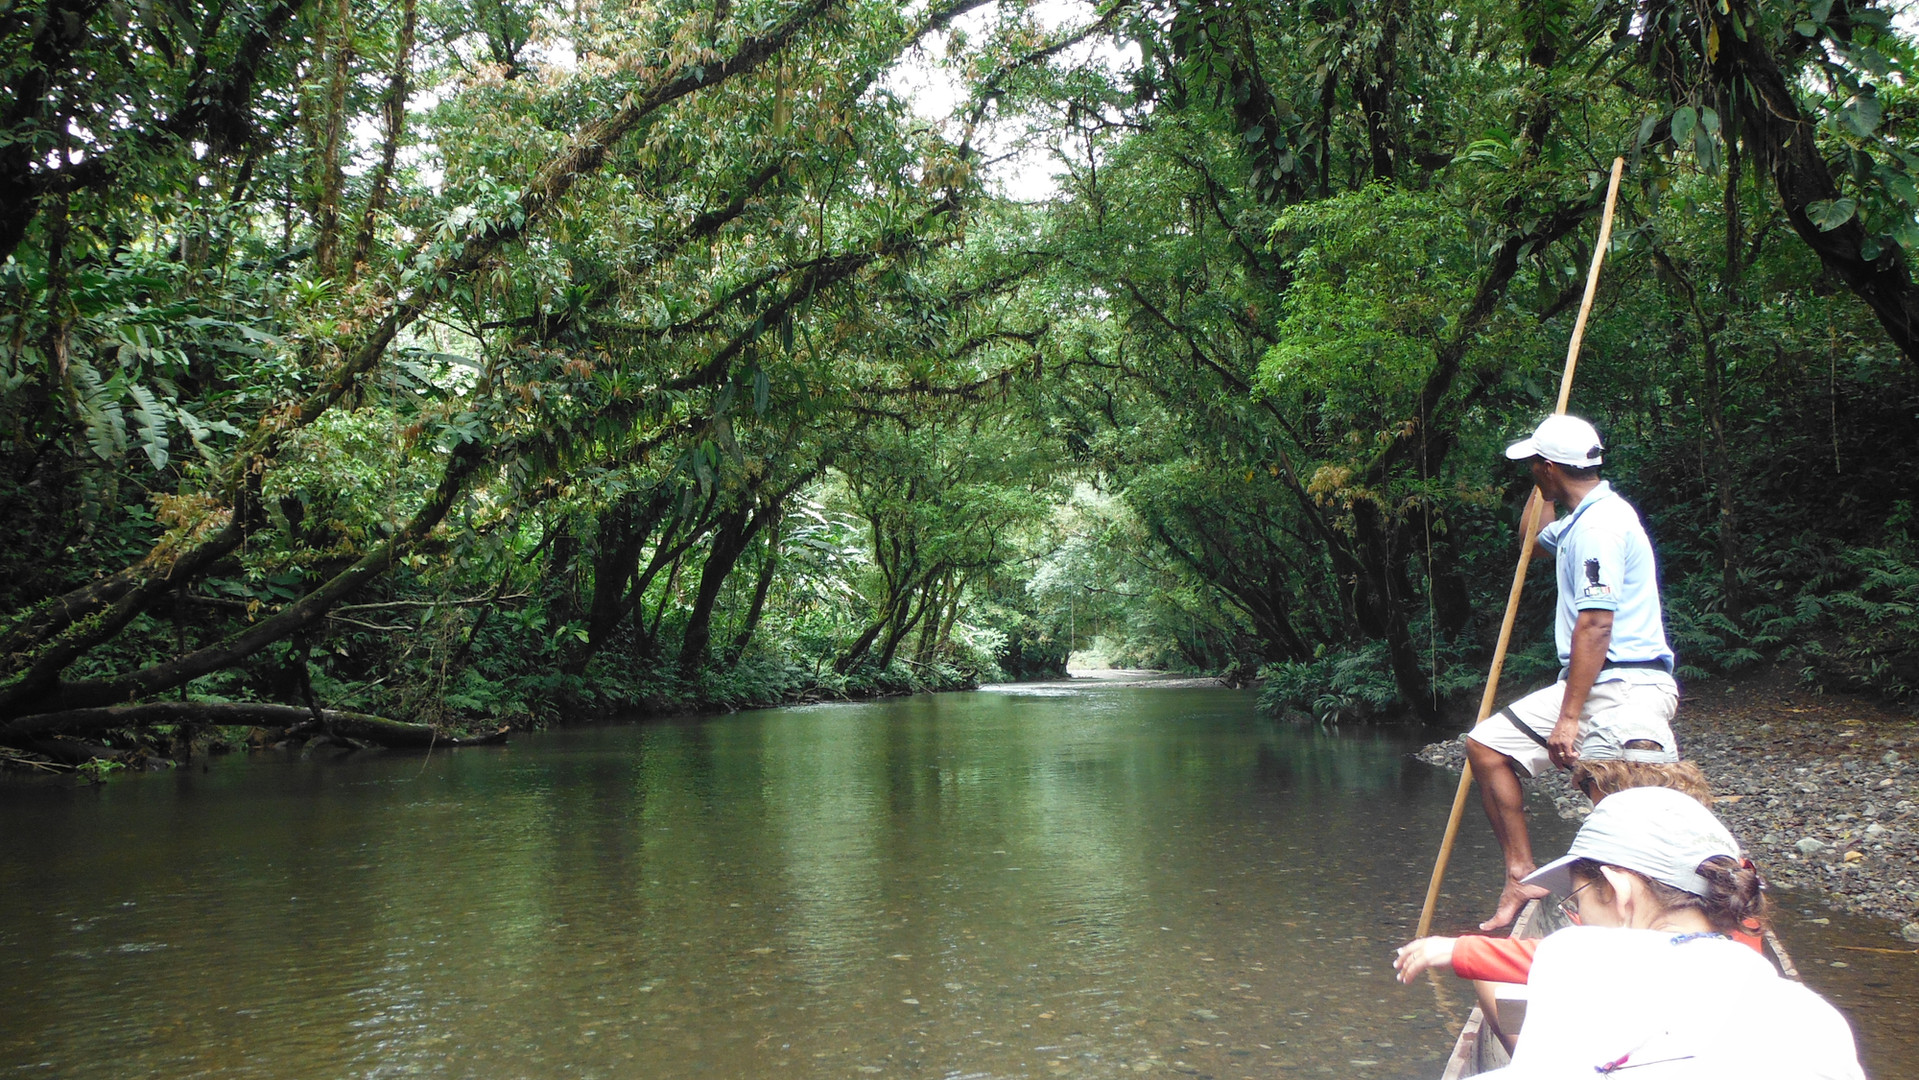 Paseo río Joví Pijibalodge